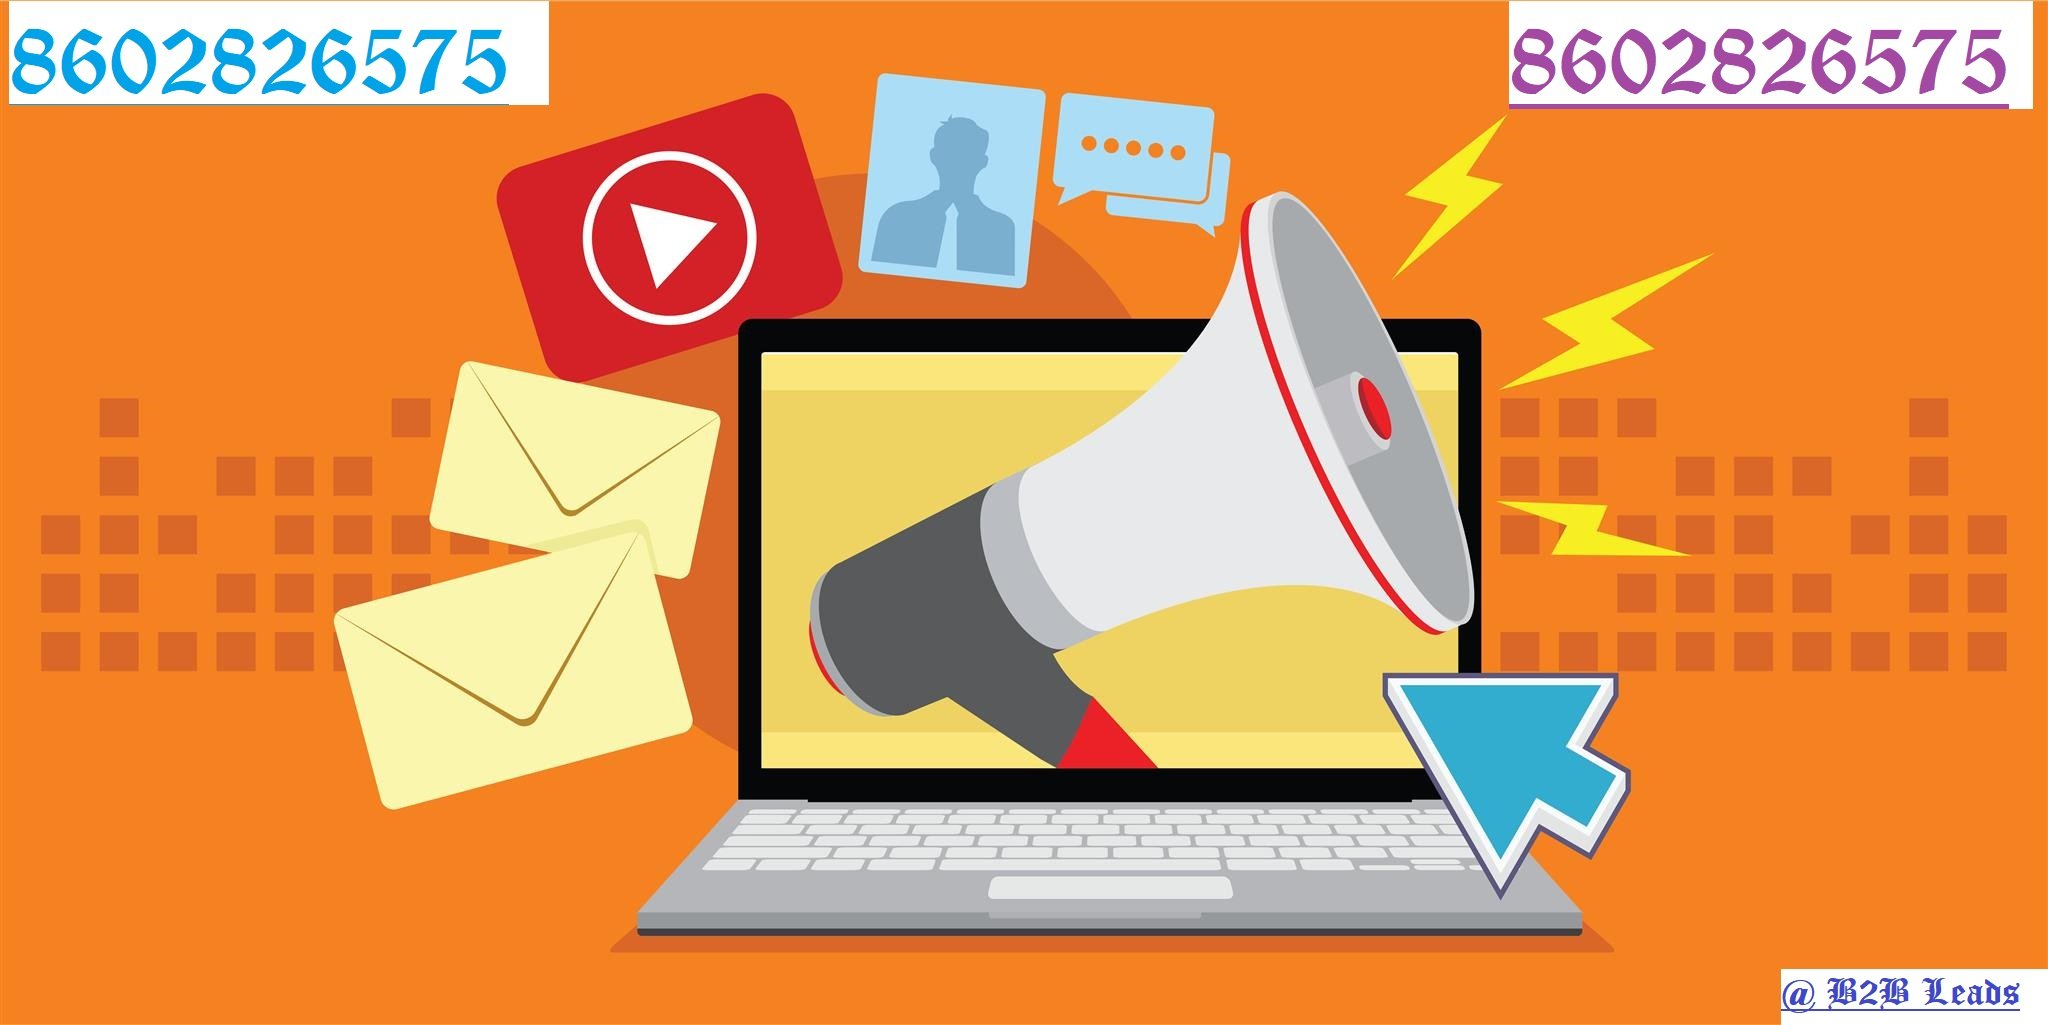 Lead Generation, Database Seller, SEO & Digital Marketing in MP